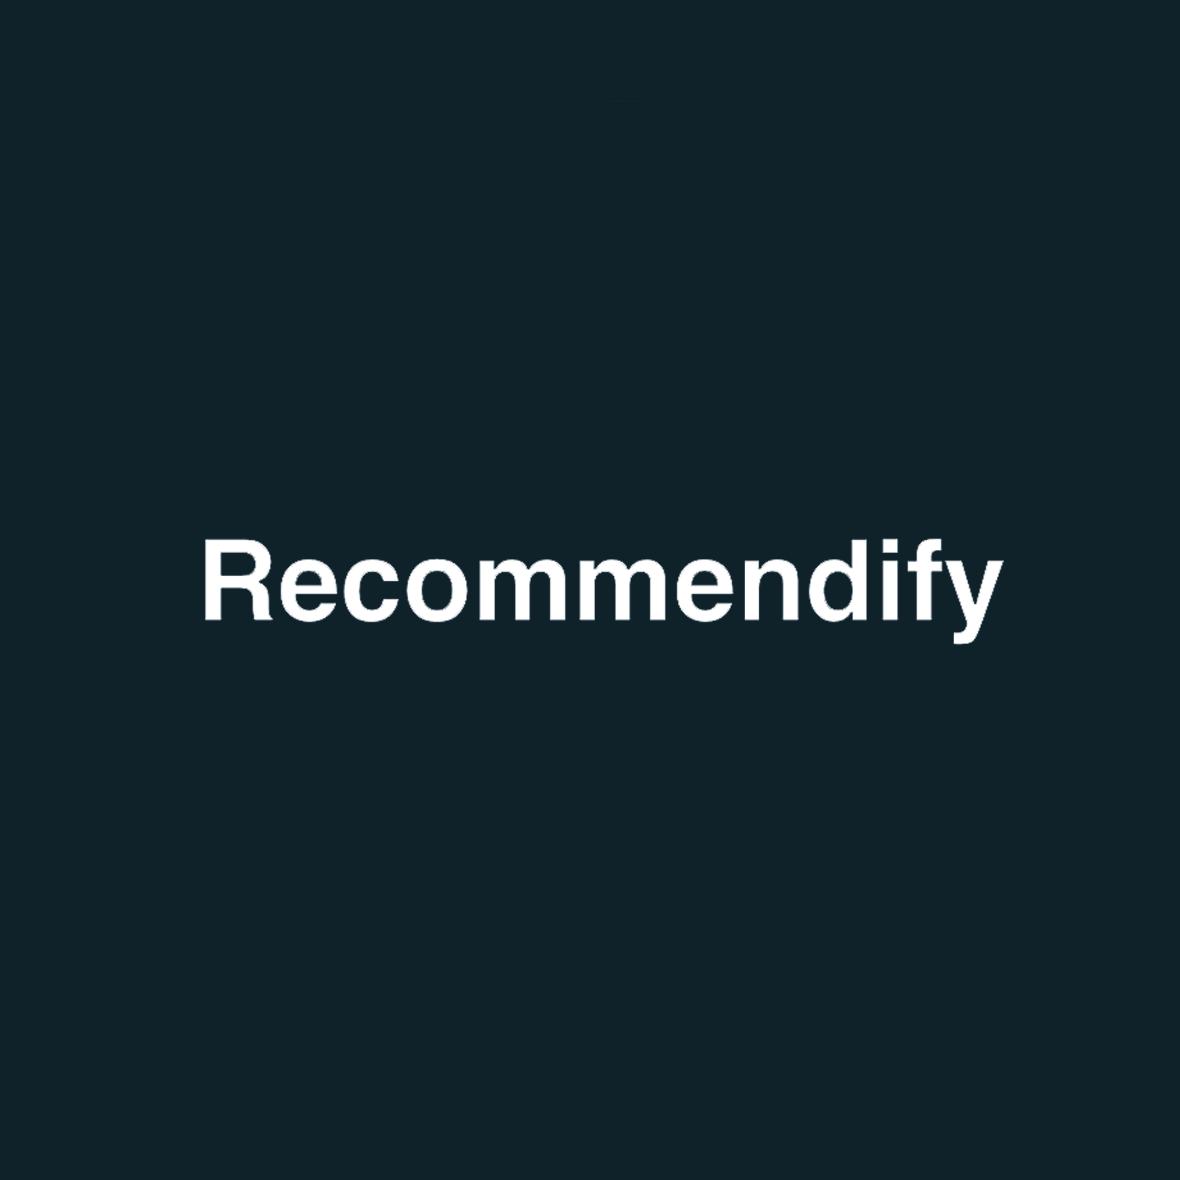 Recommendify